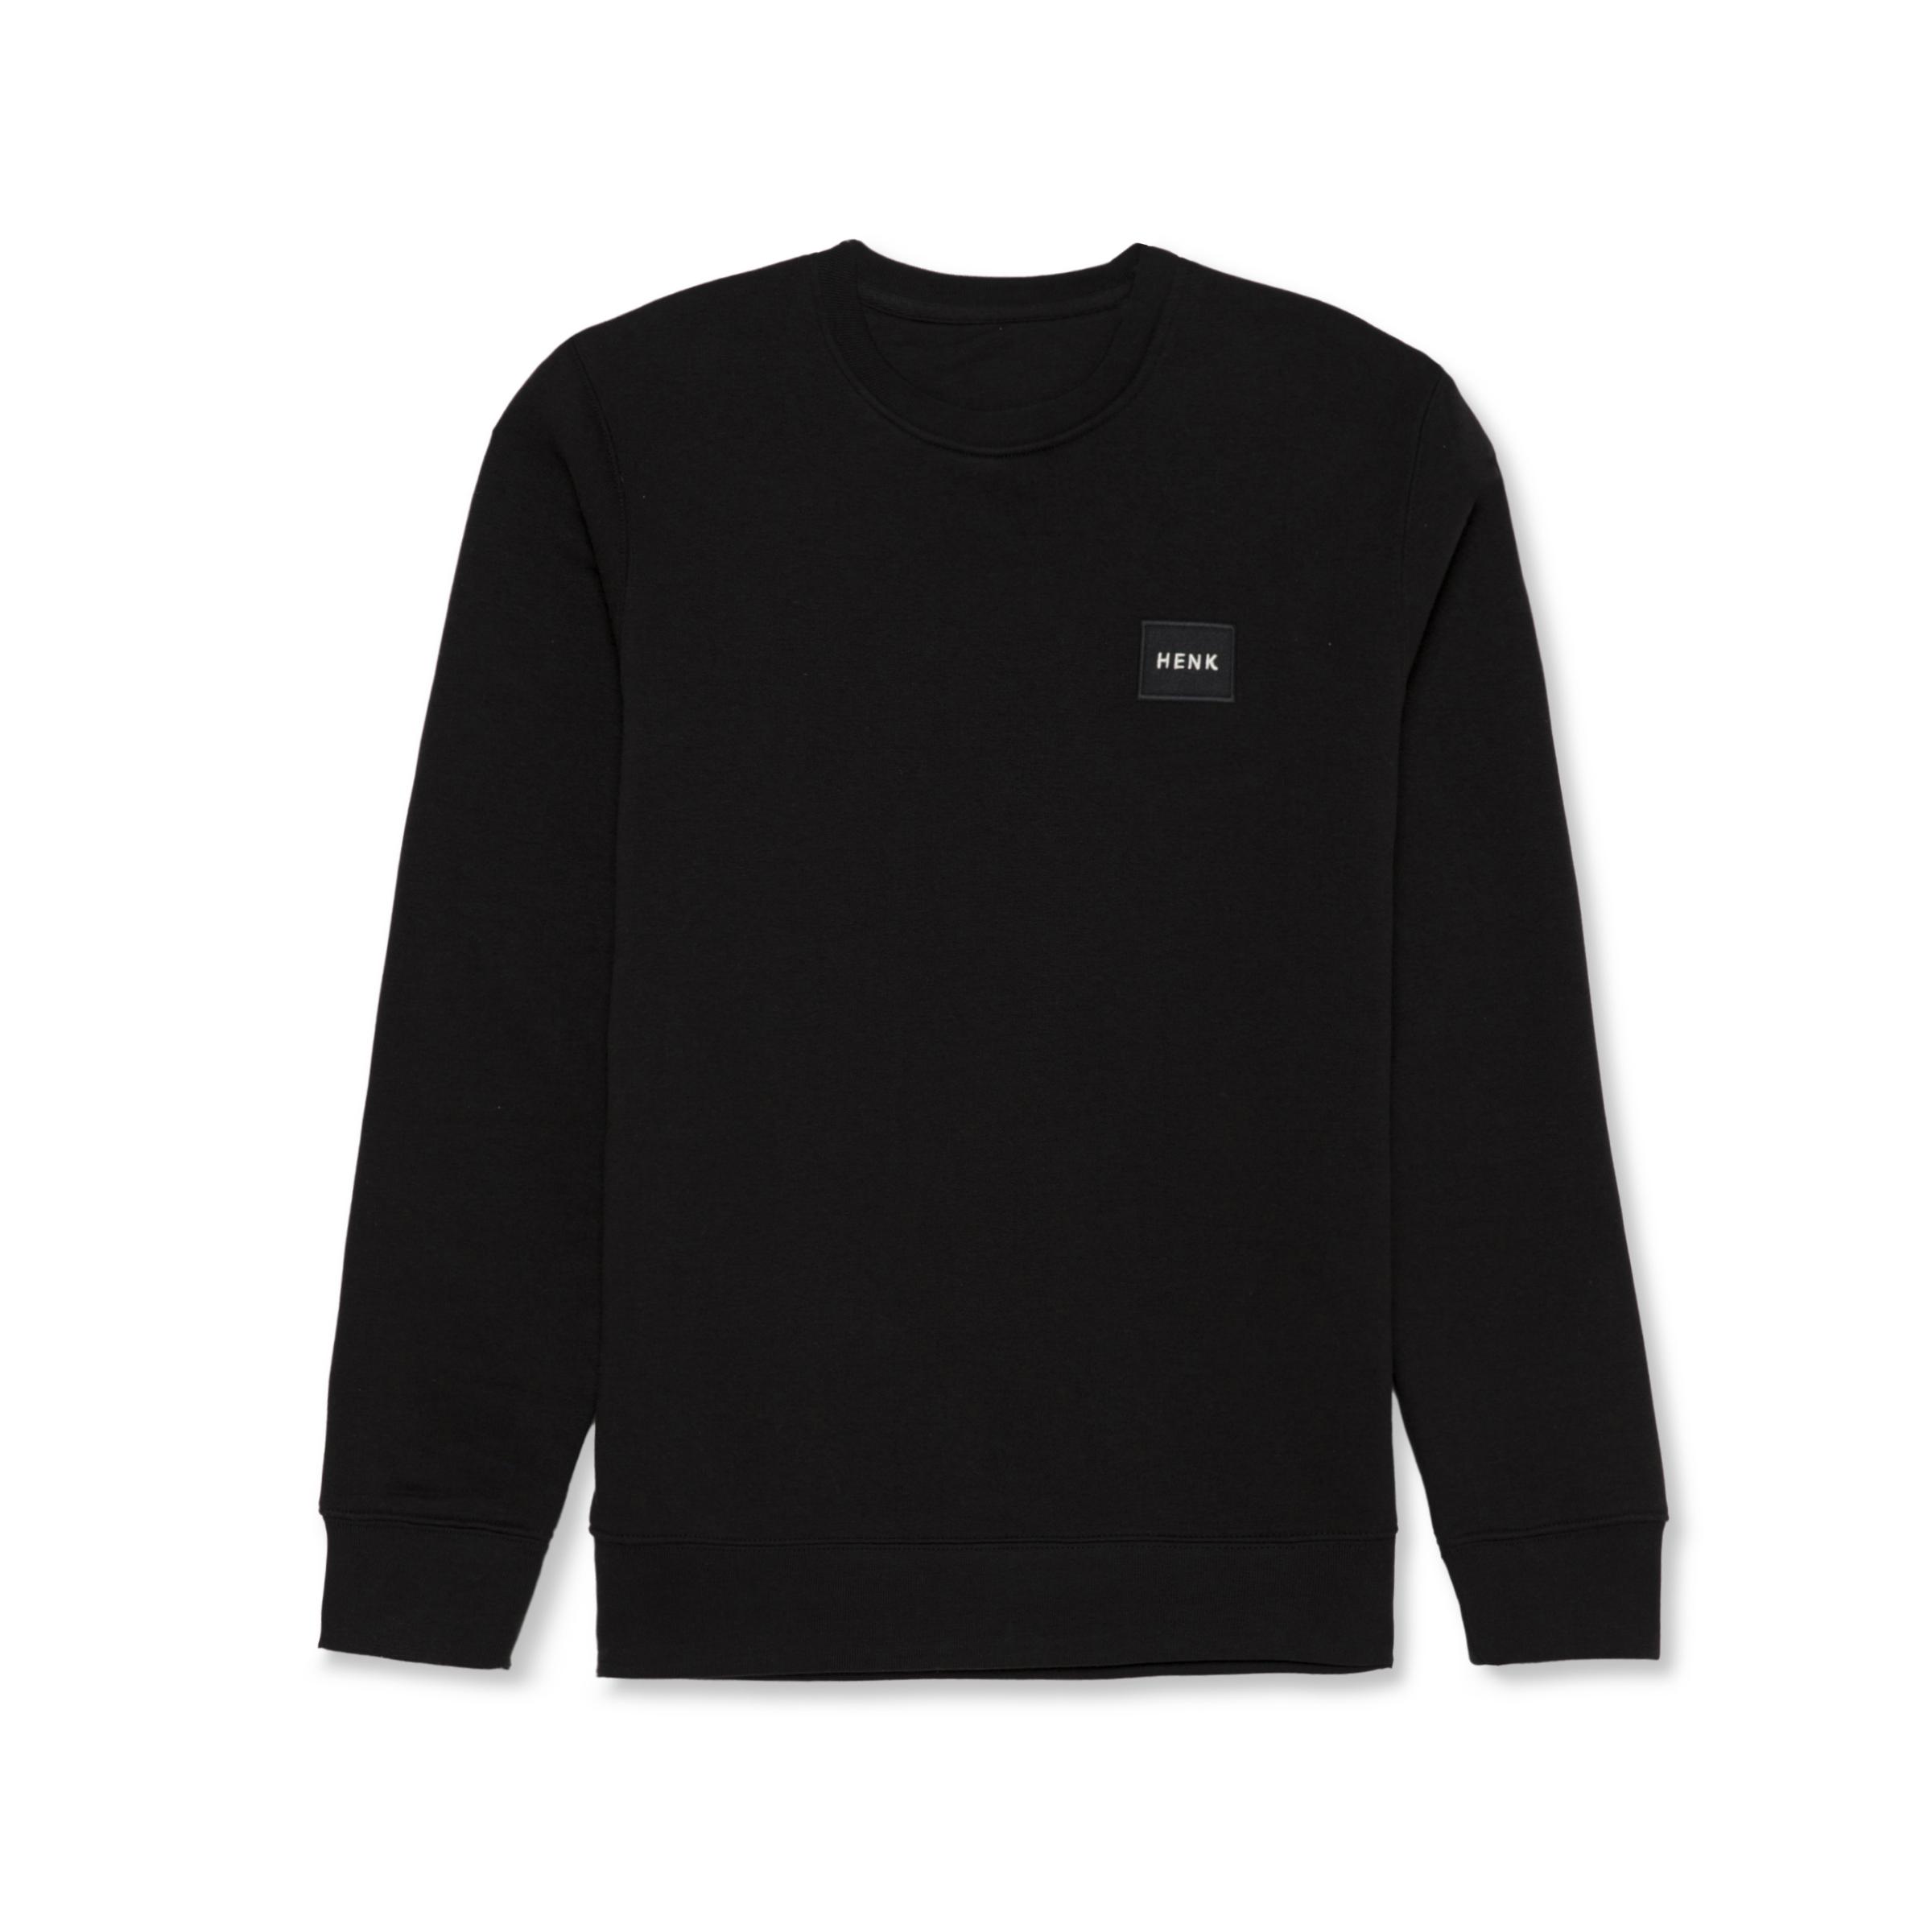 Sweater | Black | Studio HENK | Listing_image